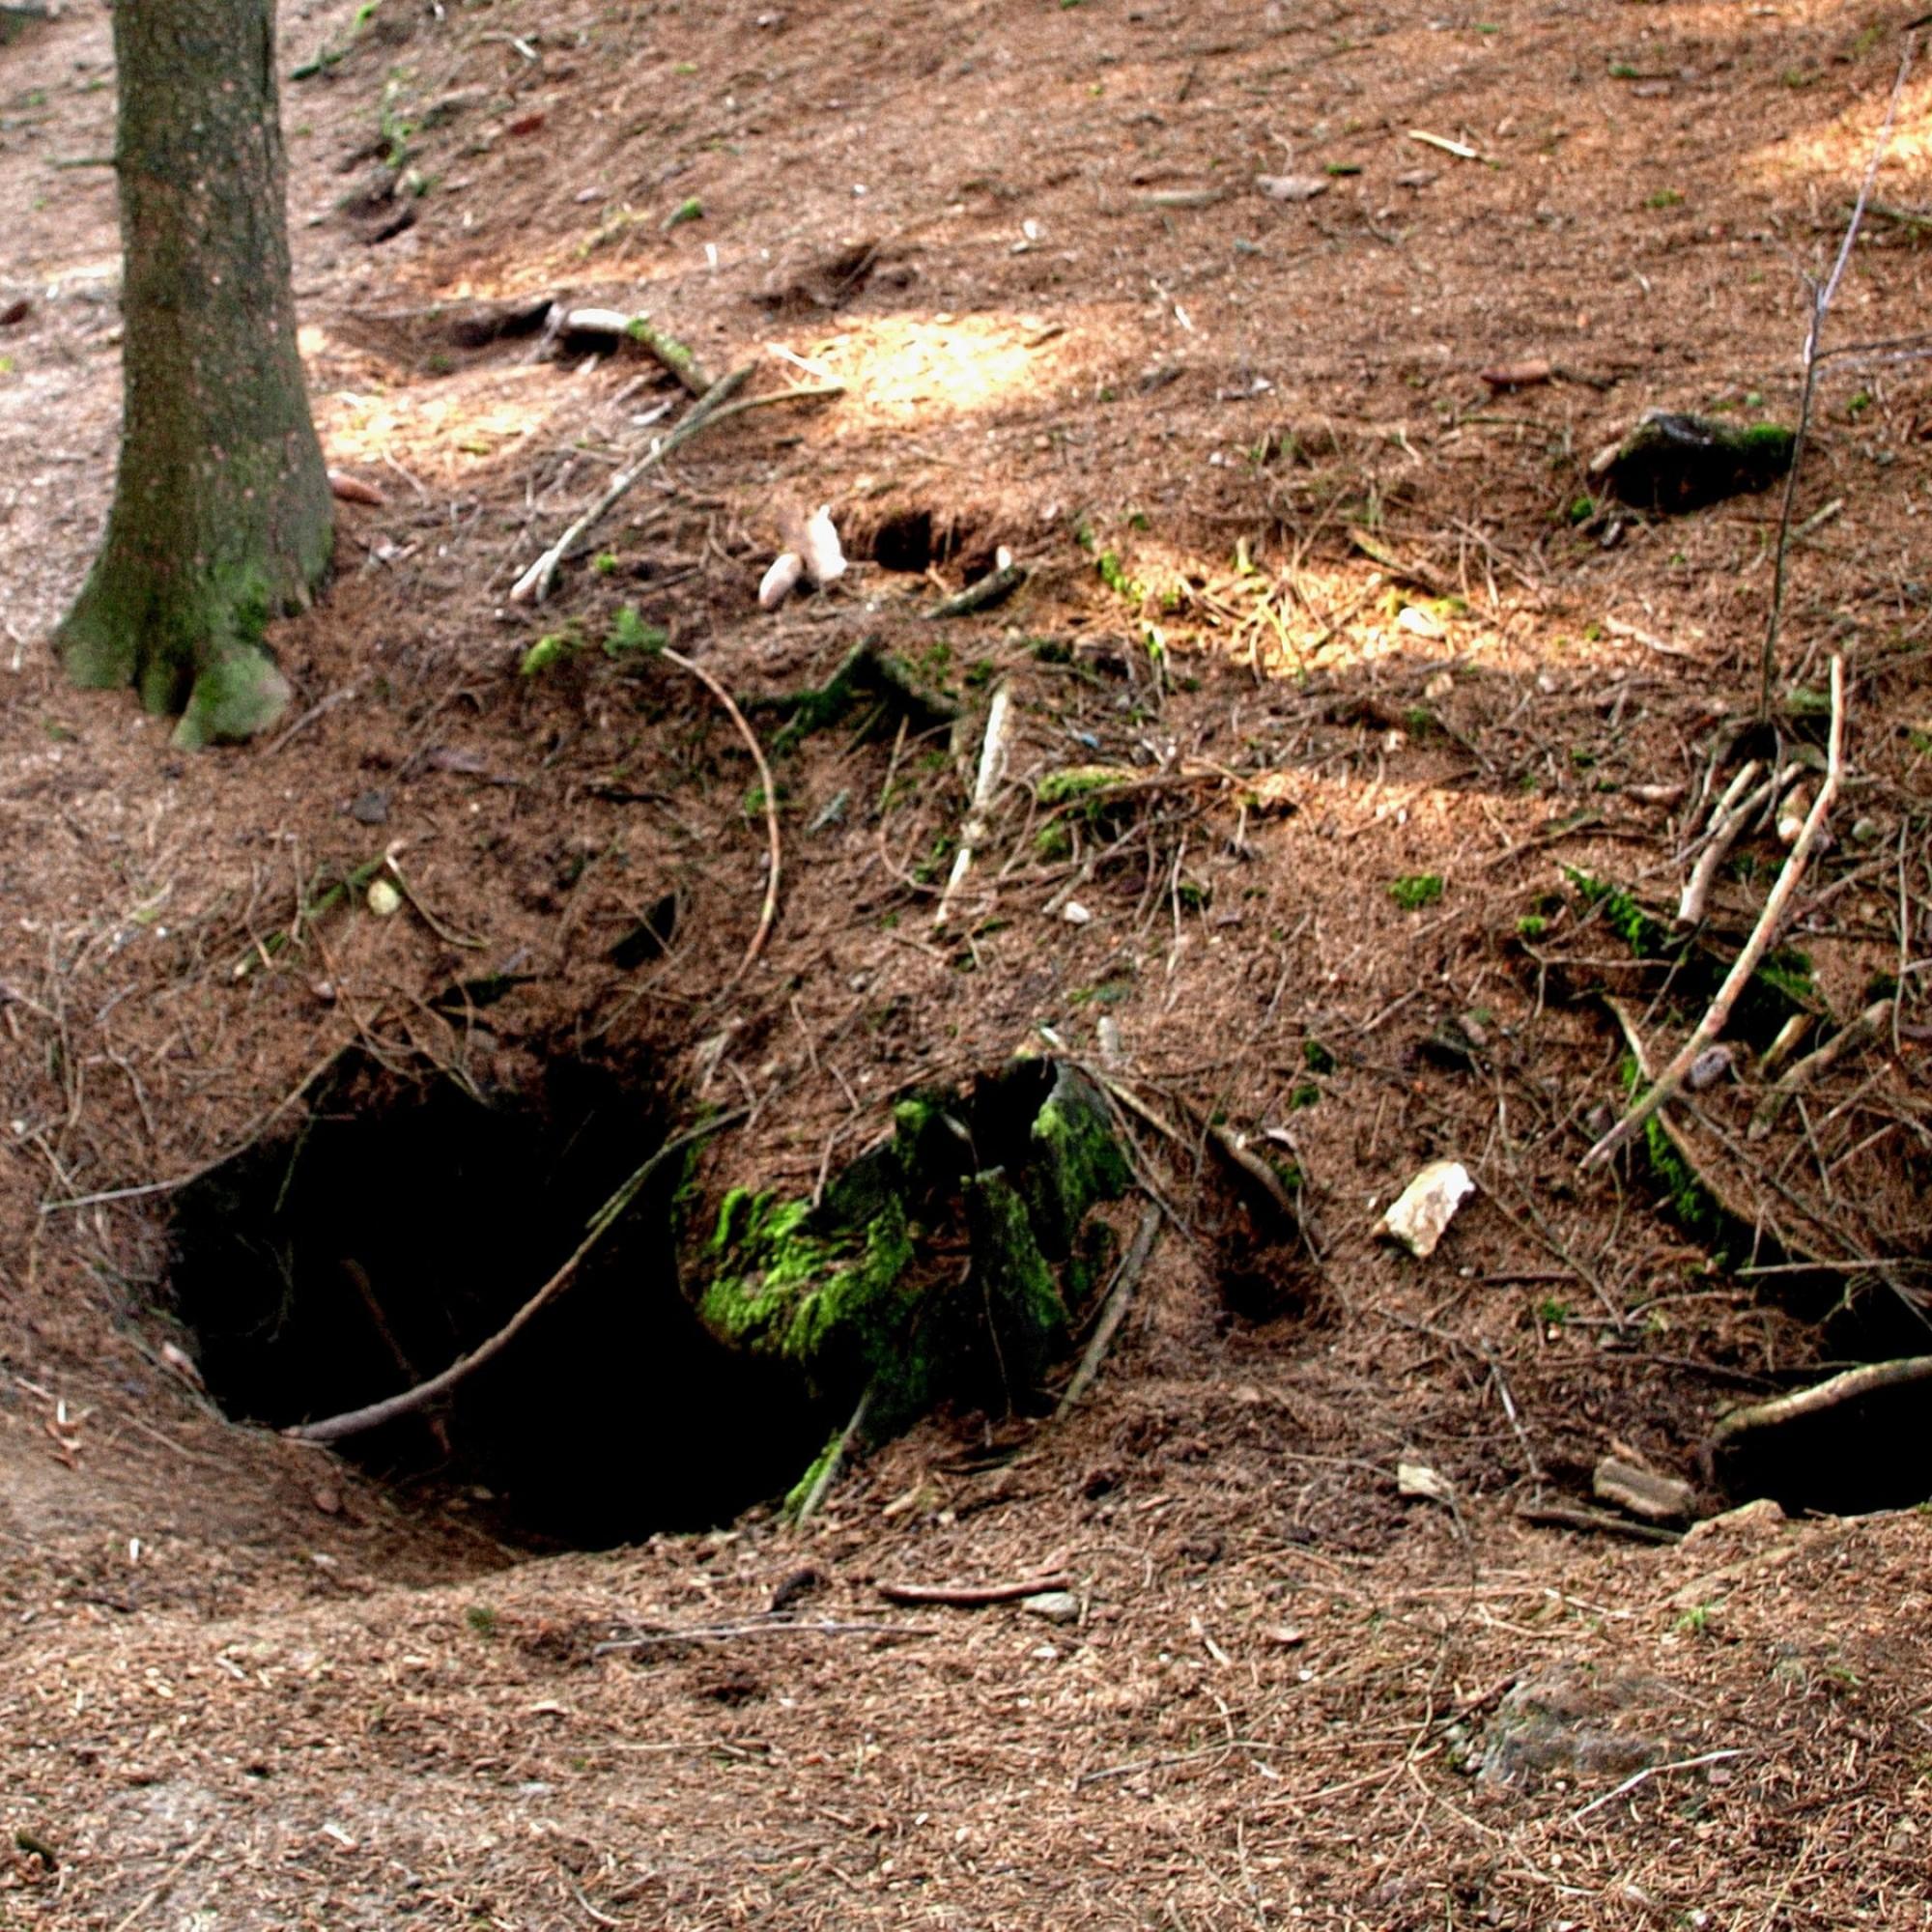 Dachs-Höhlen im Wald